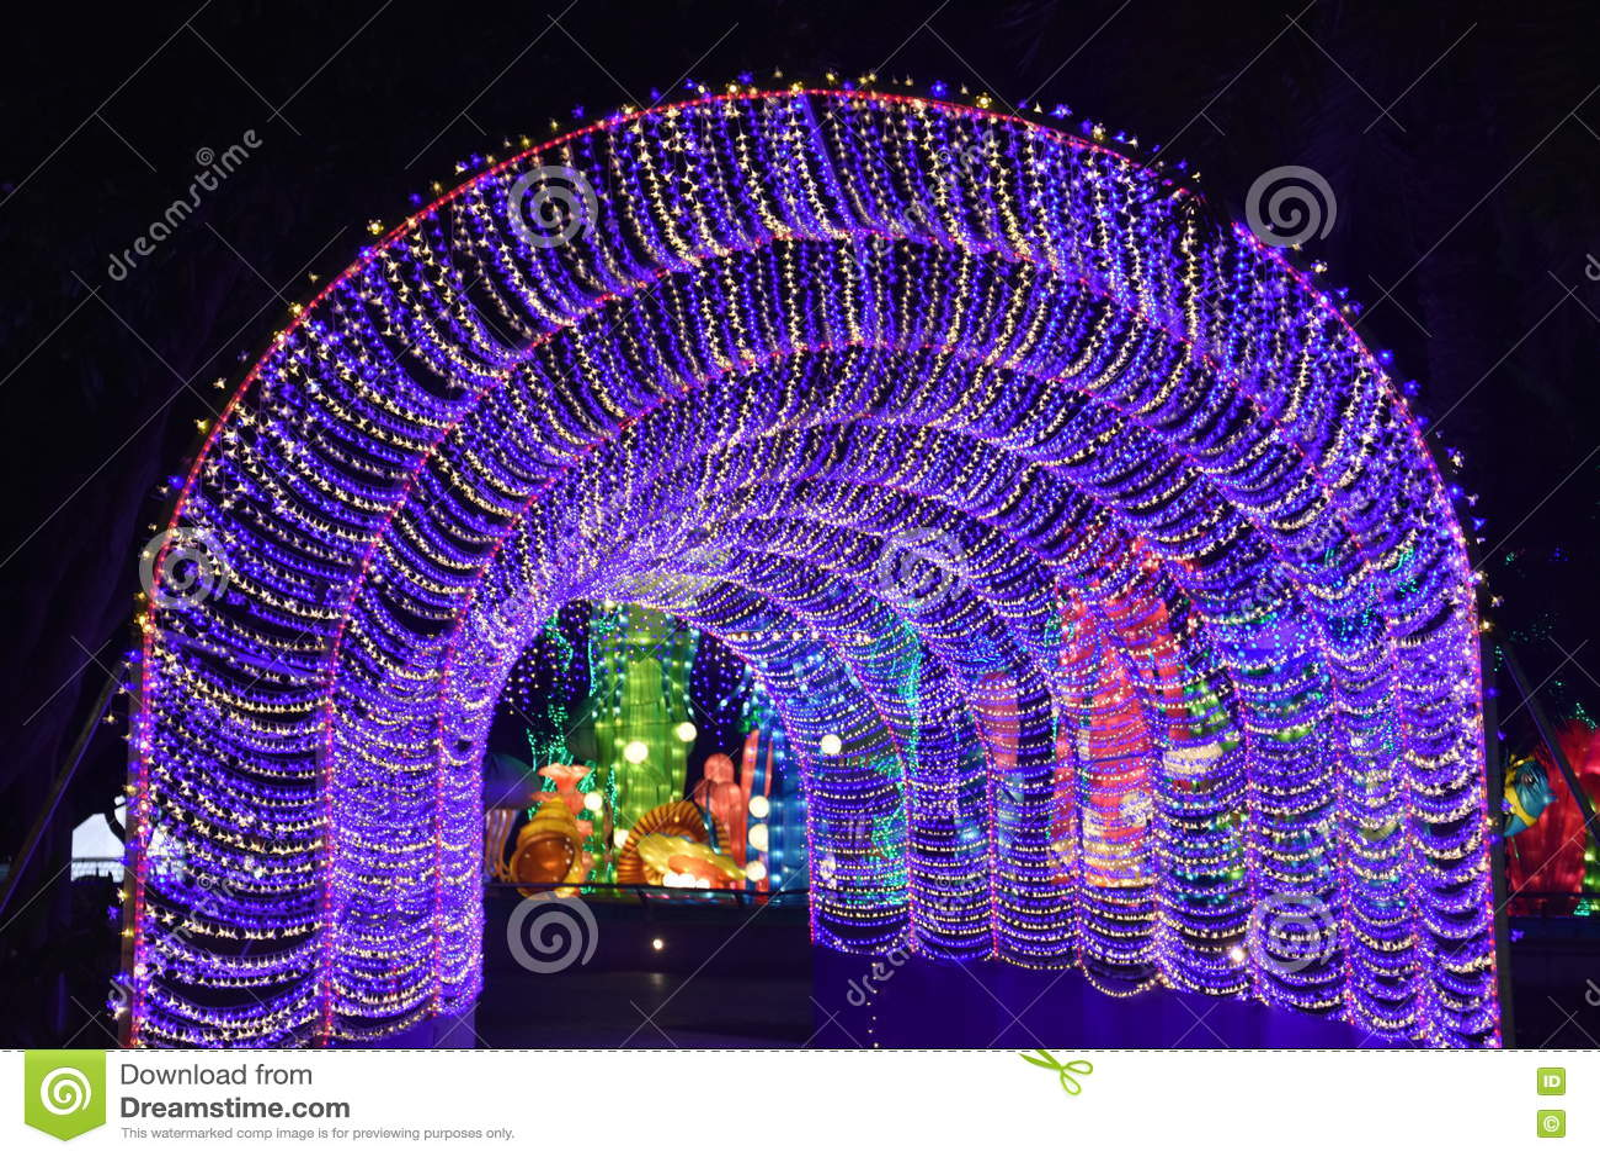 Dubai Garden Glow In Dubai Uae Editorial Photo Image Of Architecture Lights 82653511